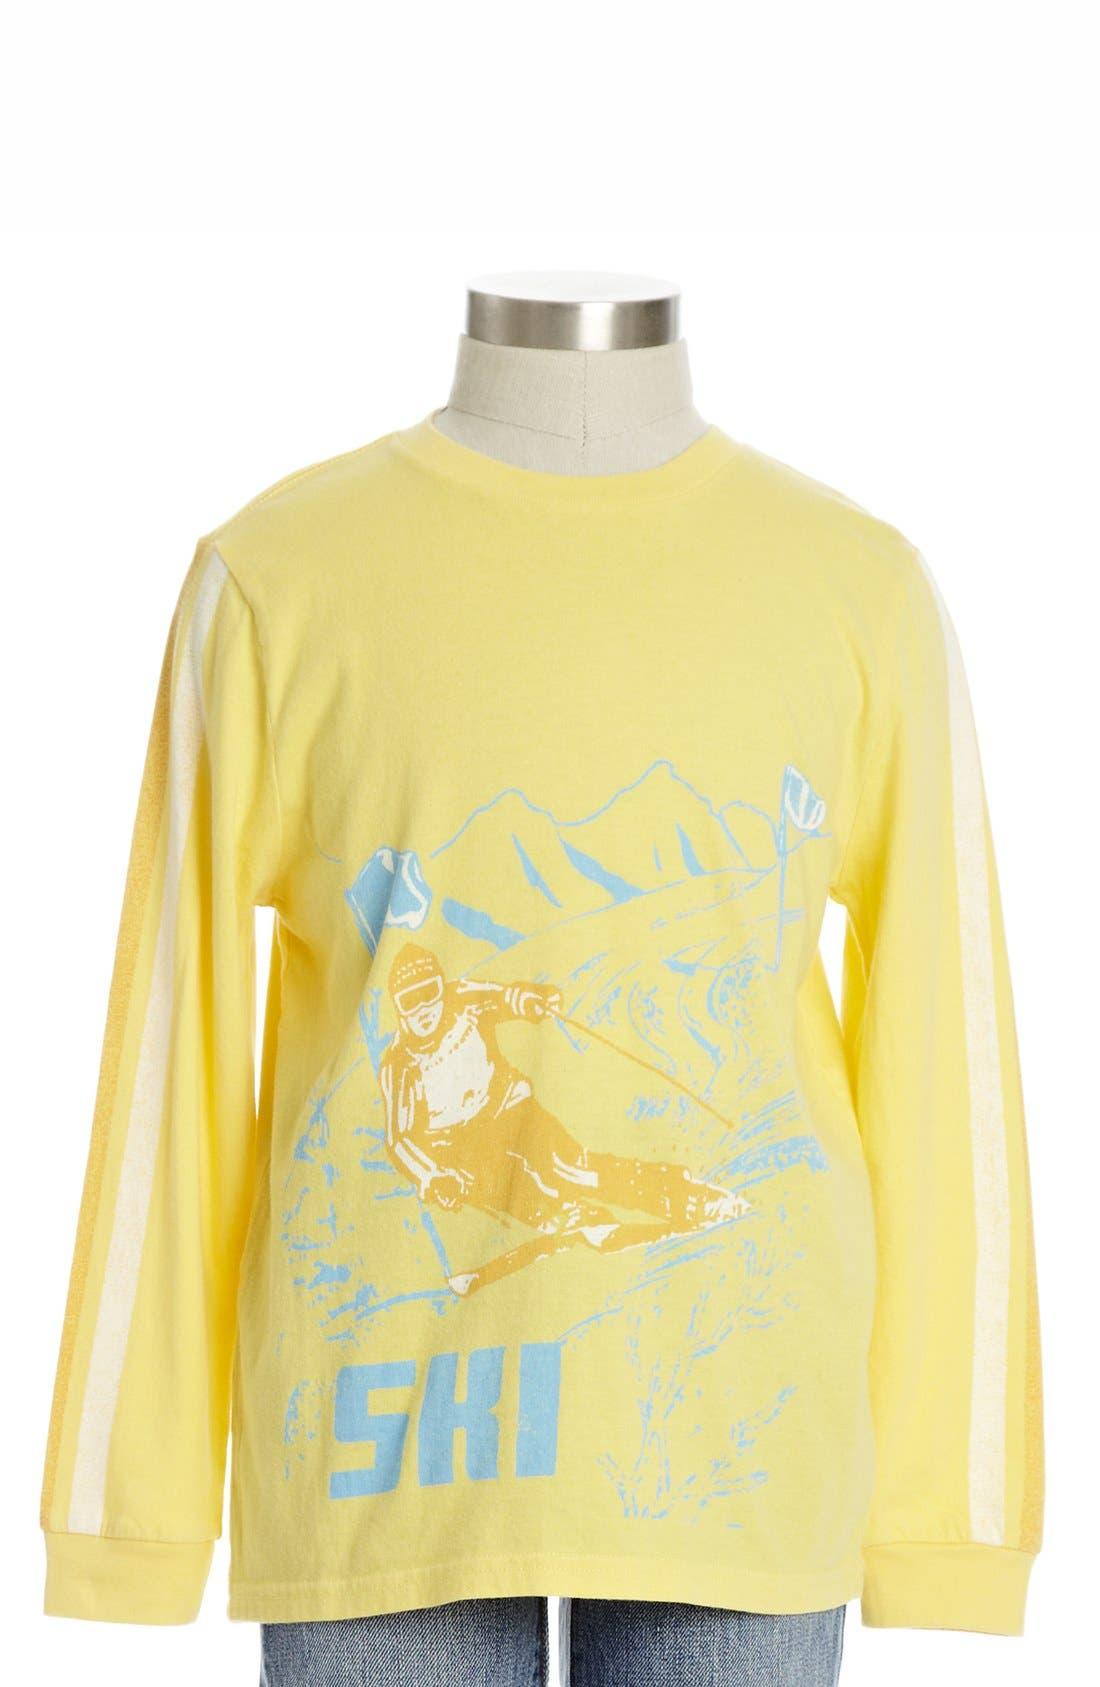 Main Image - Peek 'Carve Your Niche' Long Sleeve T-Shirt (Toddler Boys, Little Boys & Big Boys)